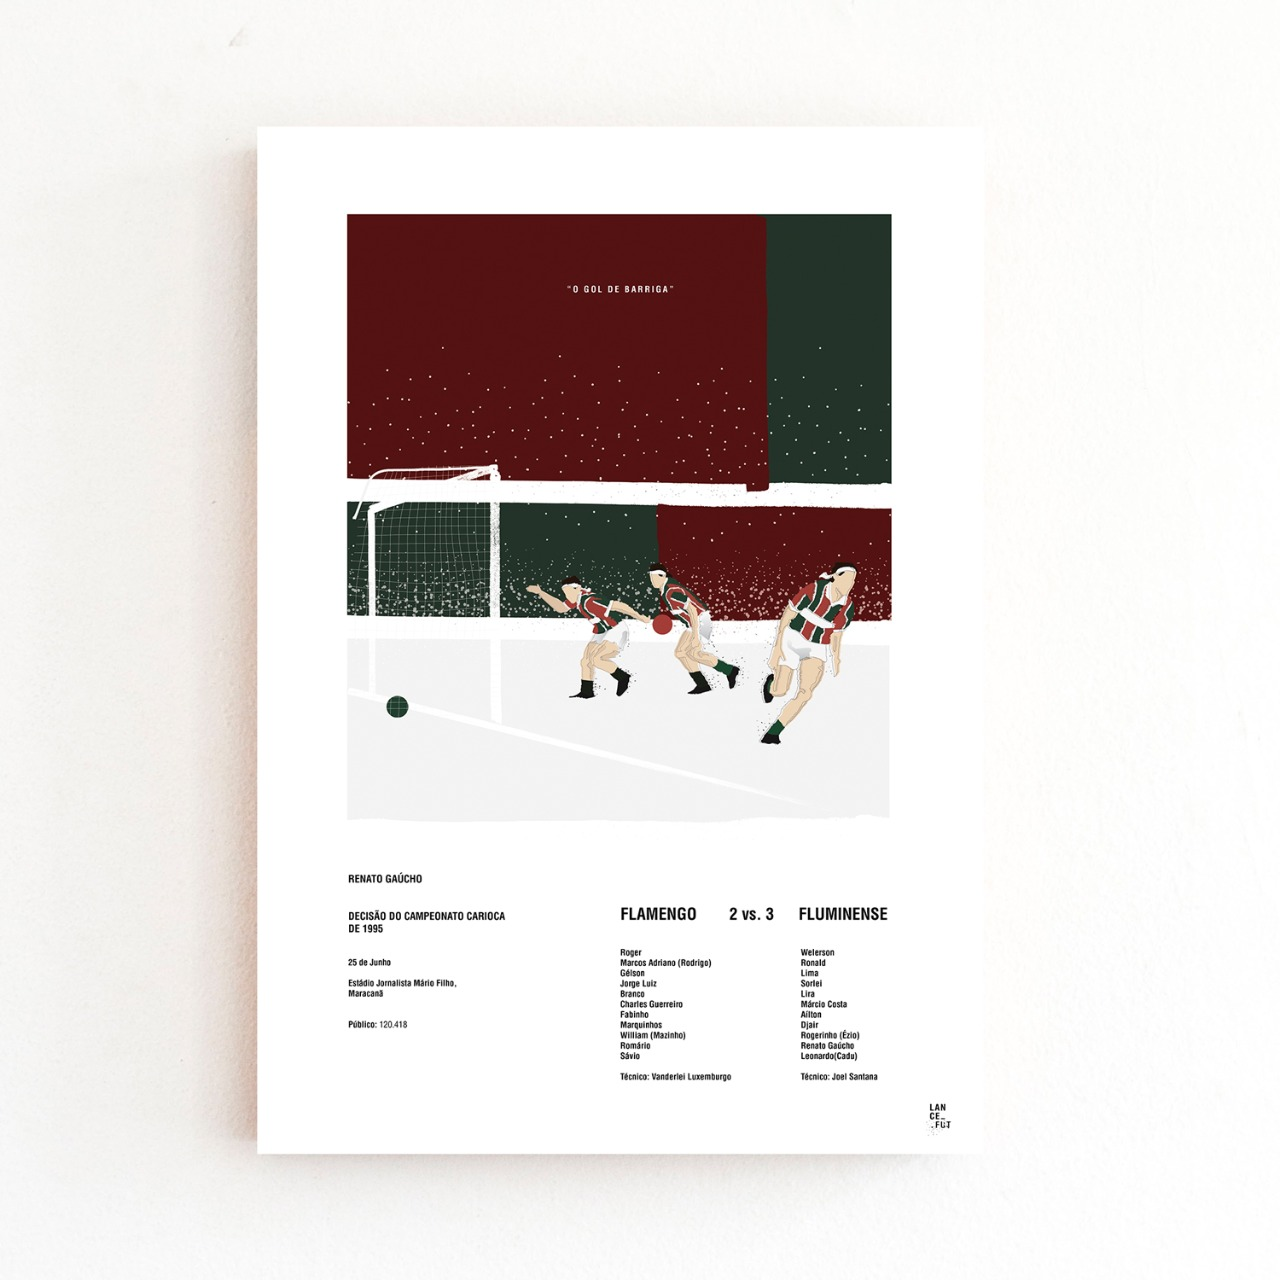 Kit Torcida Tricolor - Gol de Barriga + Voleio de Fred